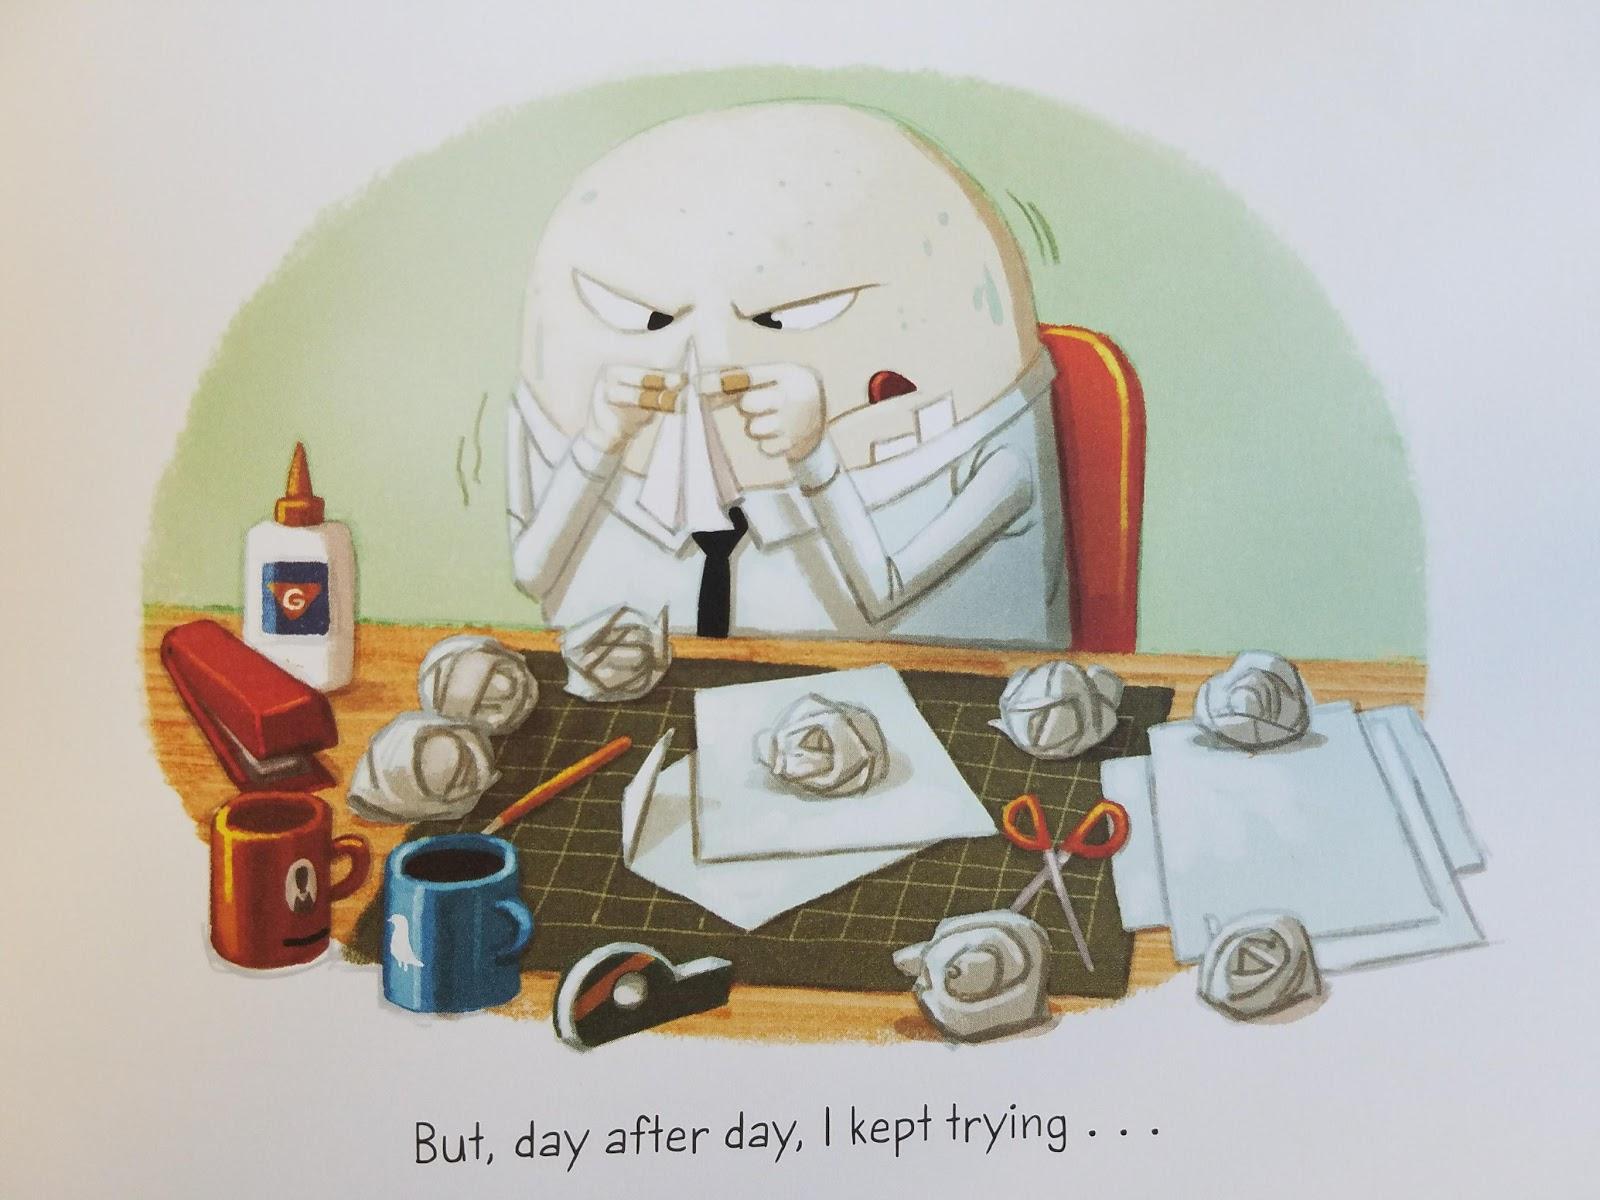 Reederama: ReedALOUD: After the Fall: How Humpty Dumpty Got Back Up Again